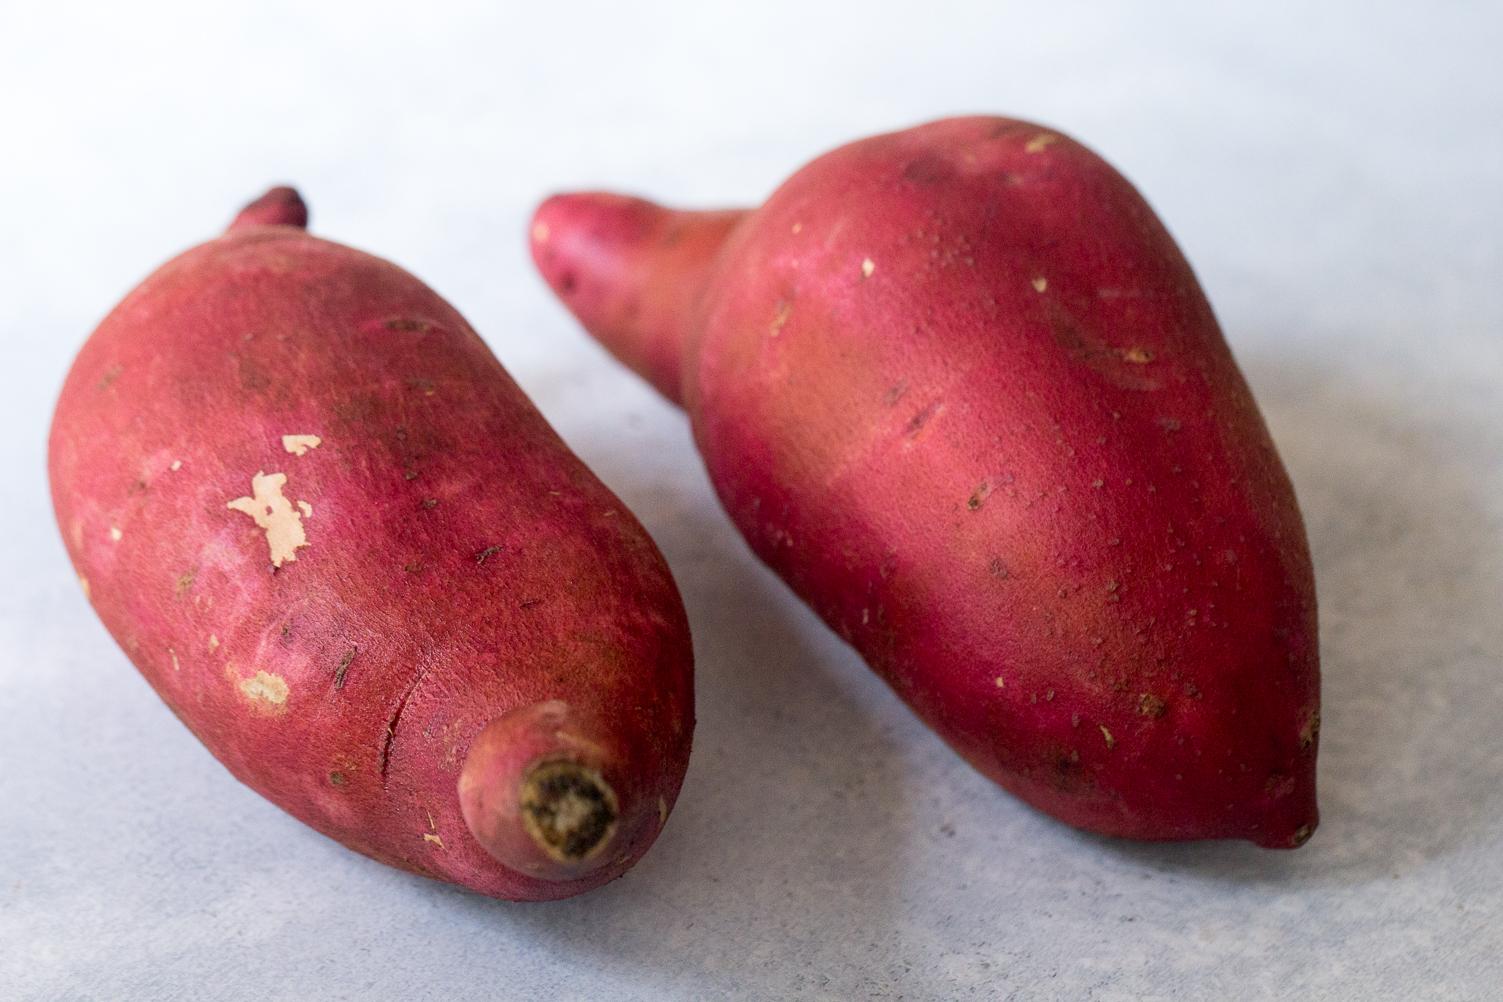 Raw sweet potatoes